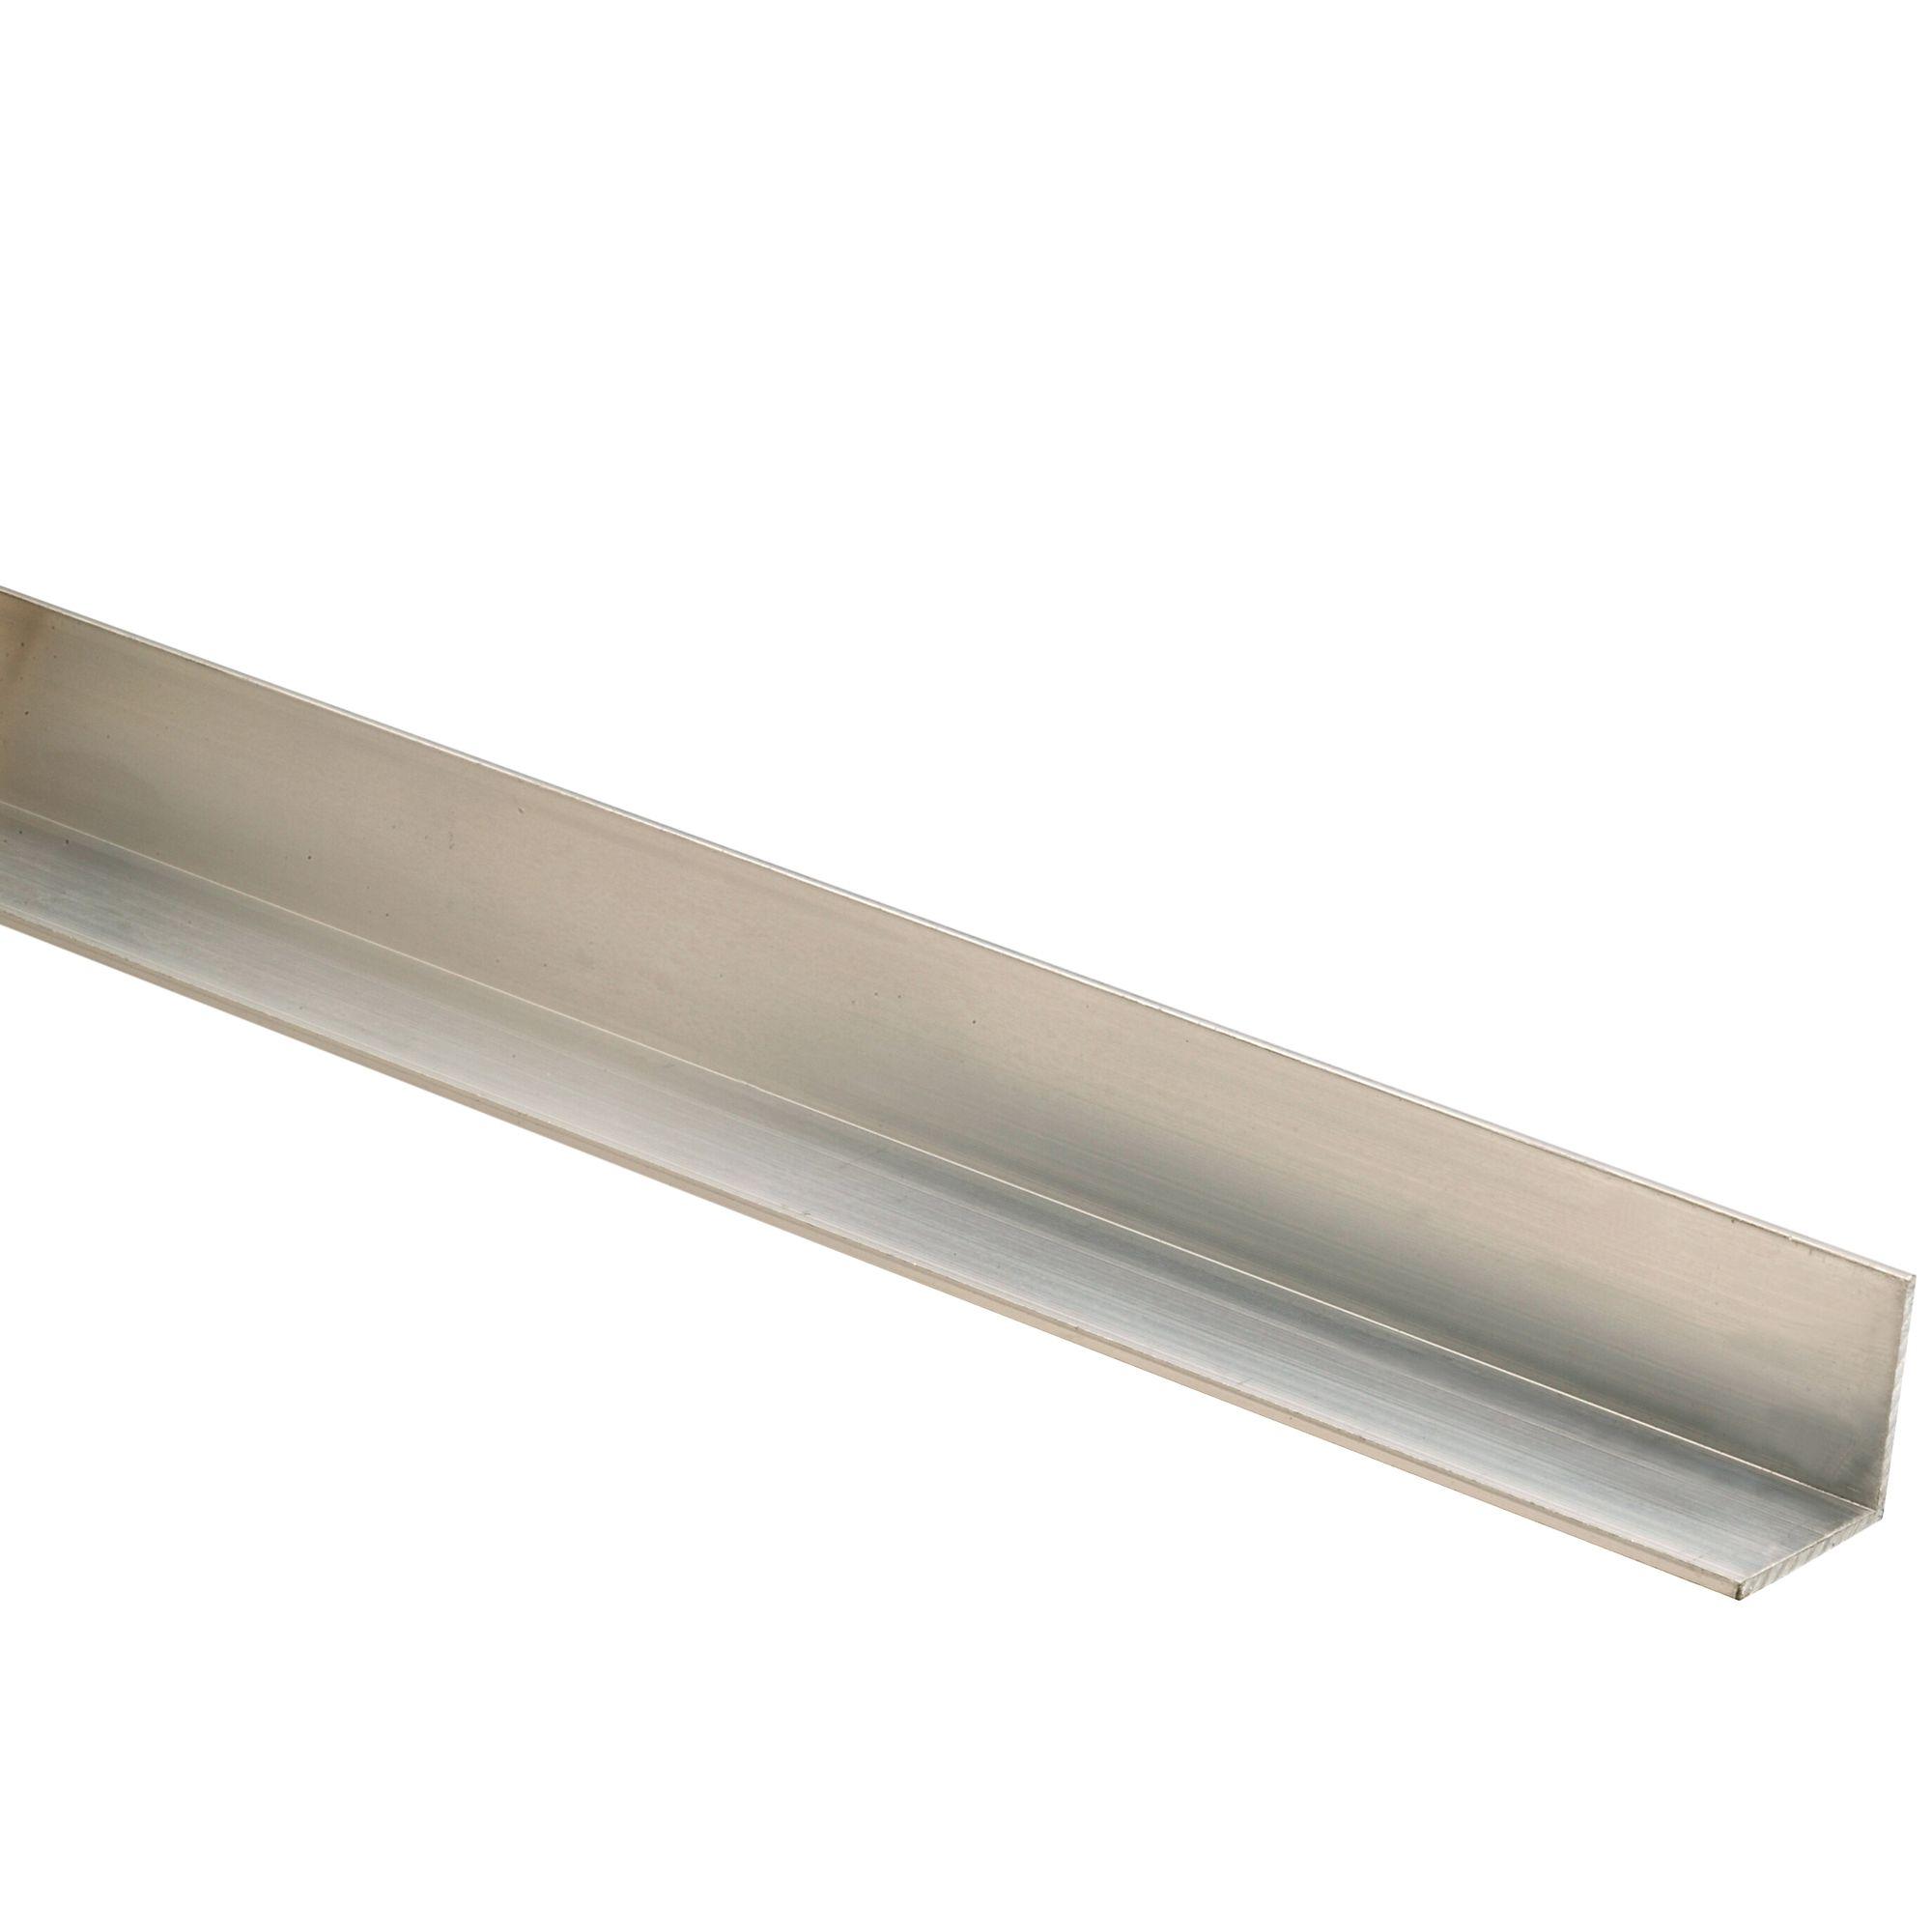 Aluminium Angle Moulding